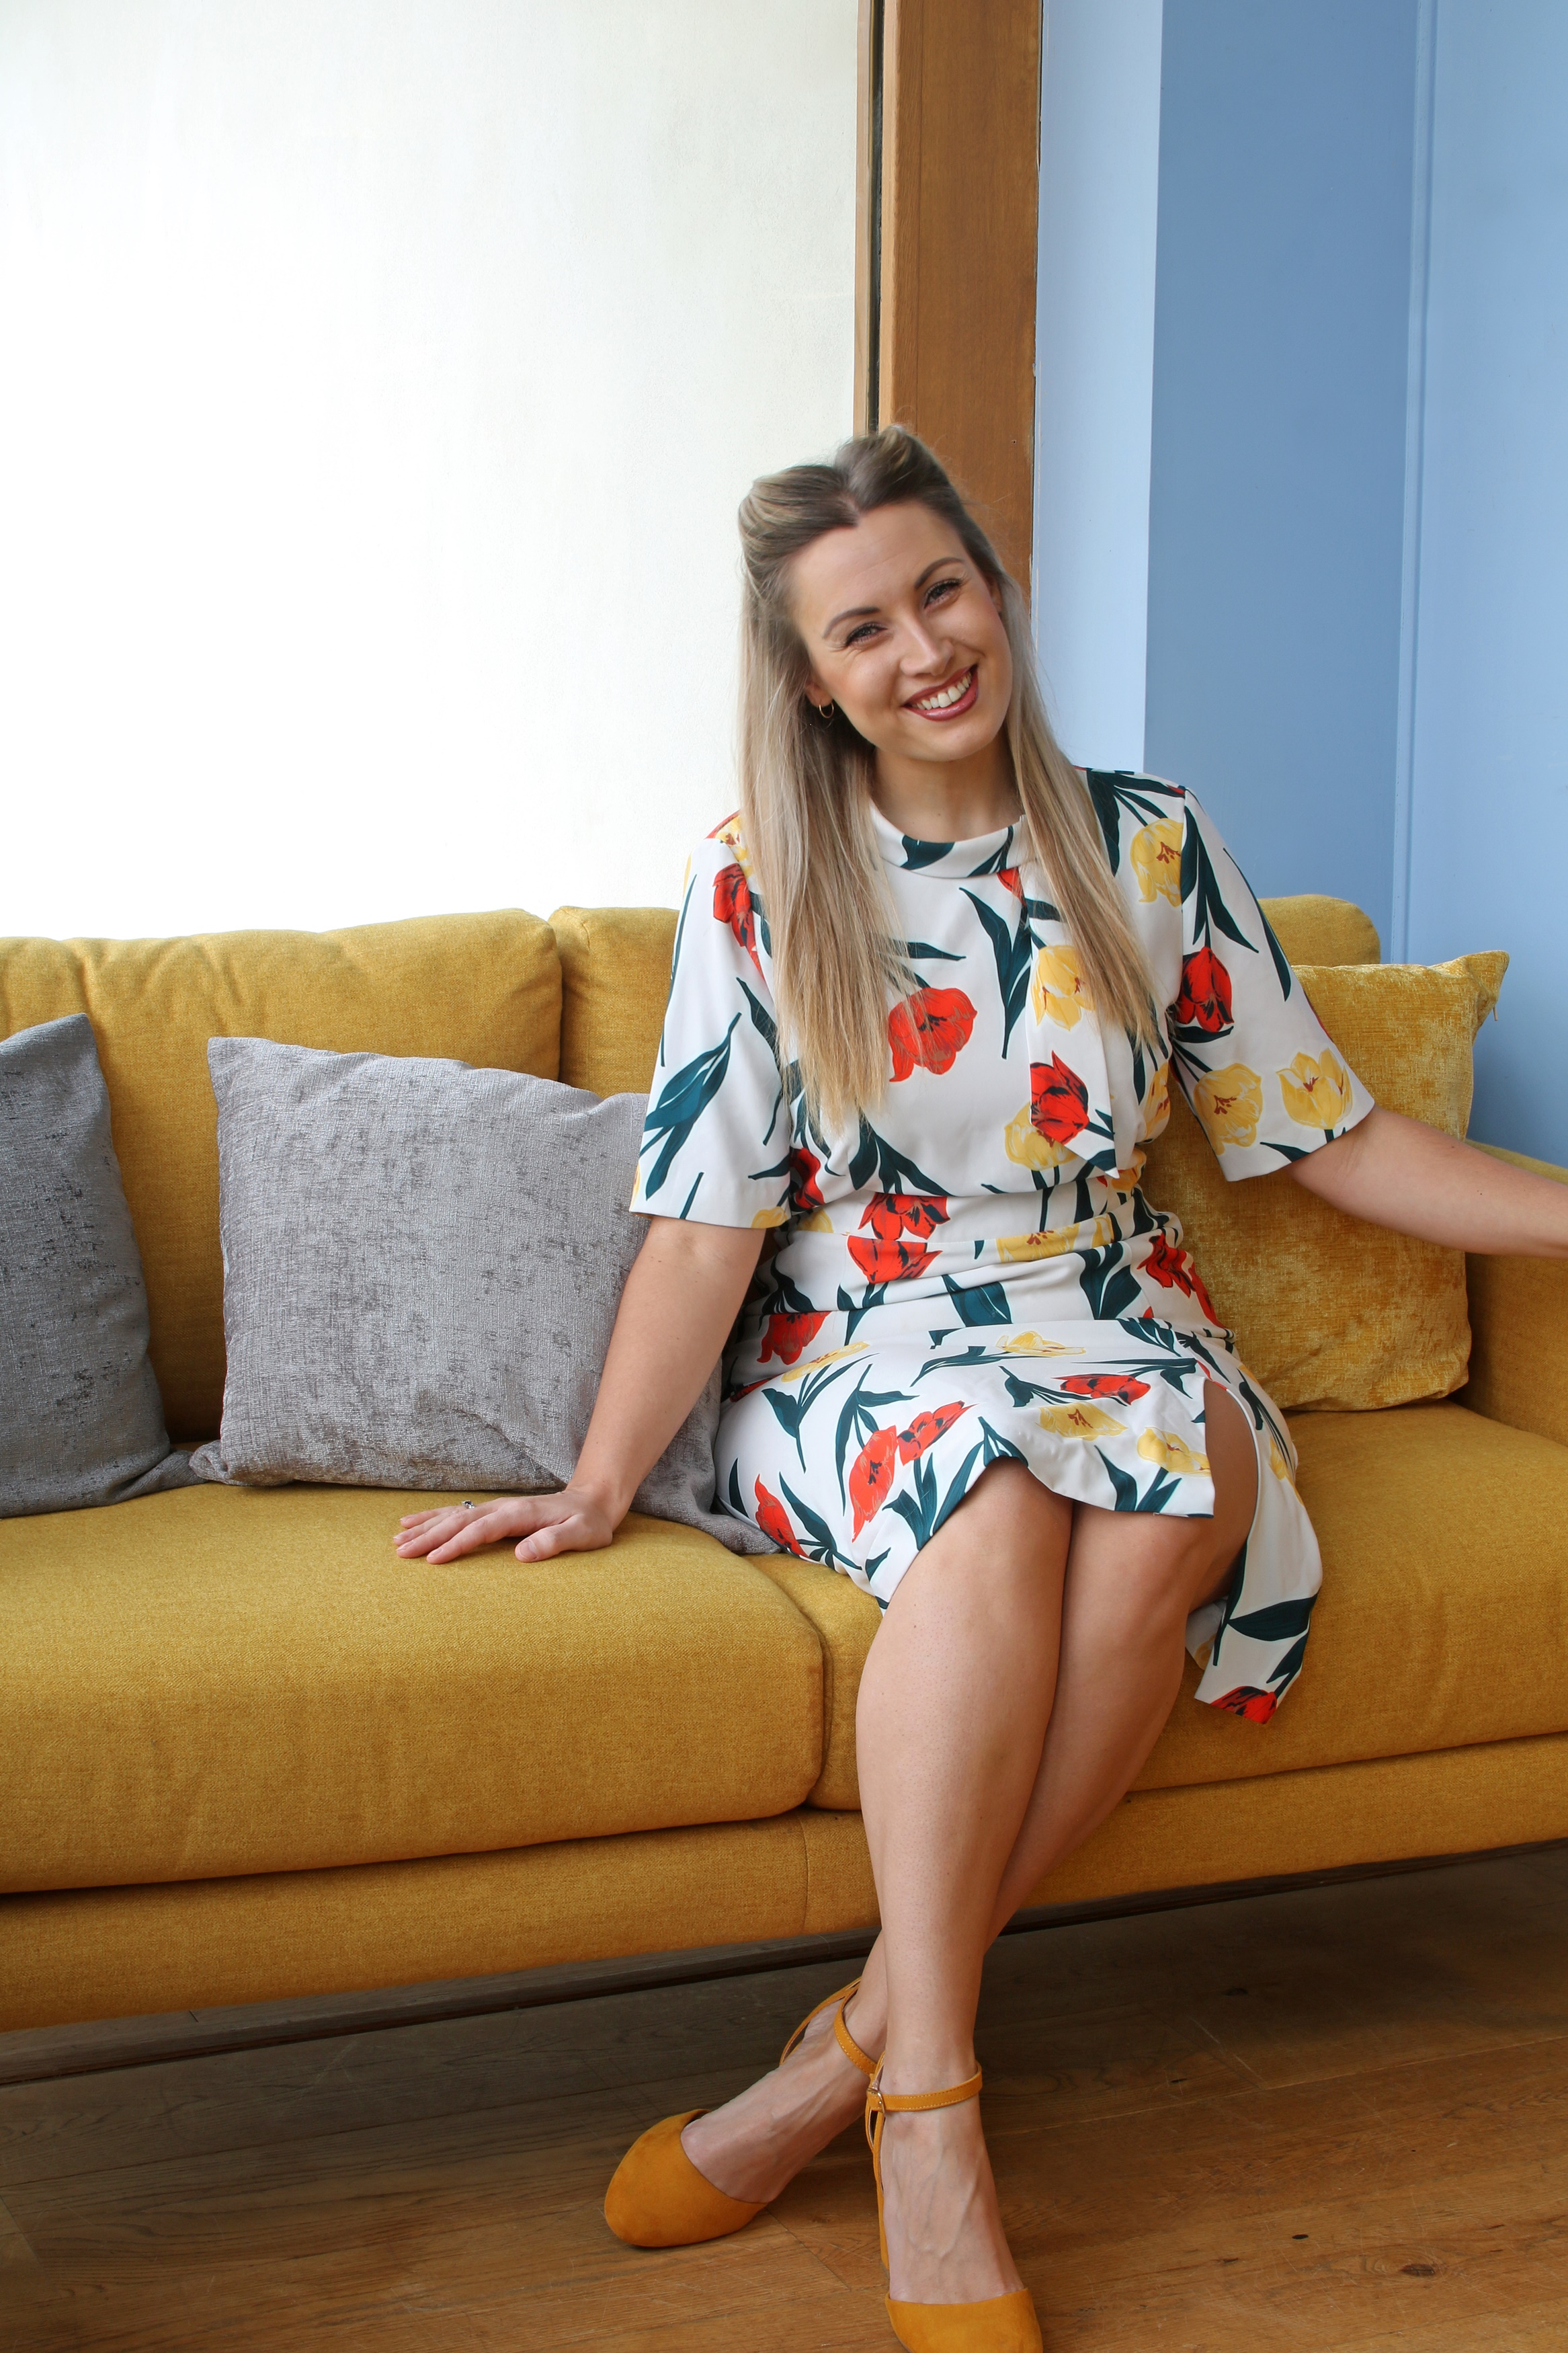 Briony Harford